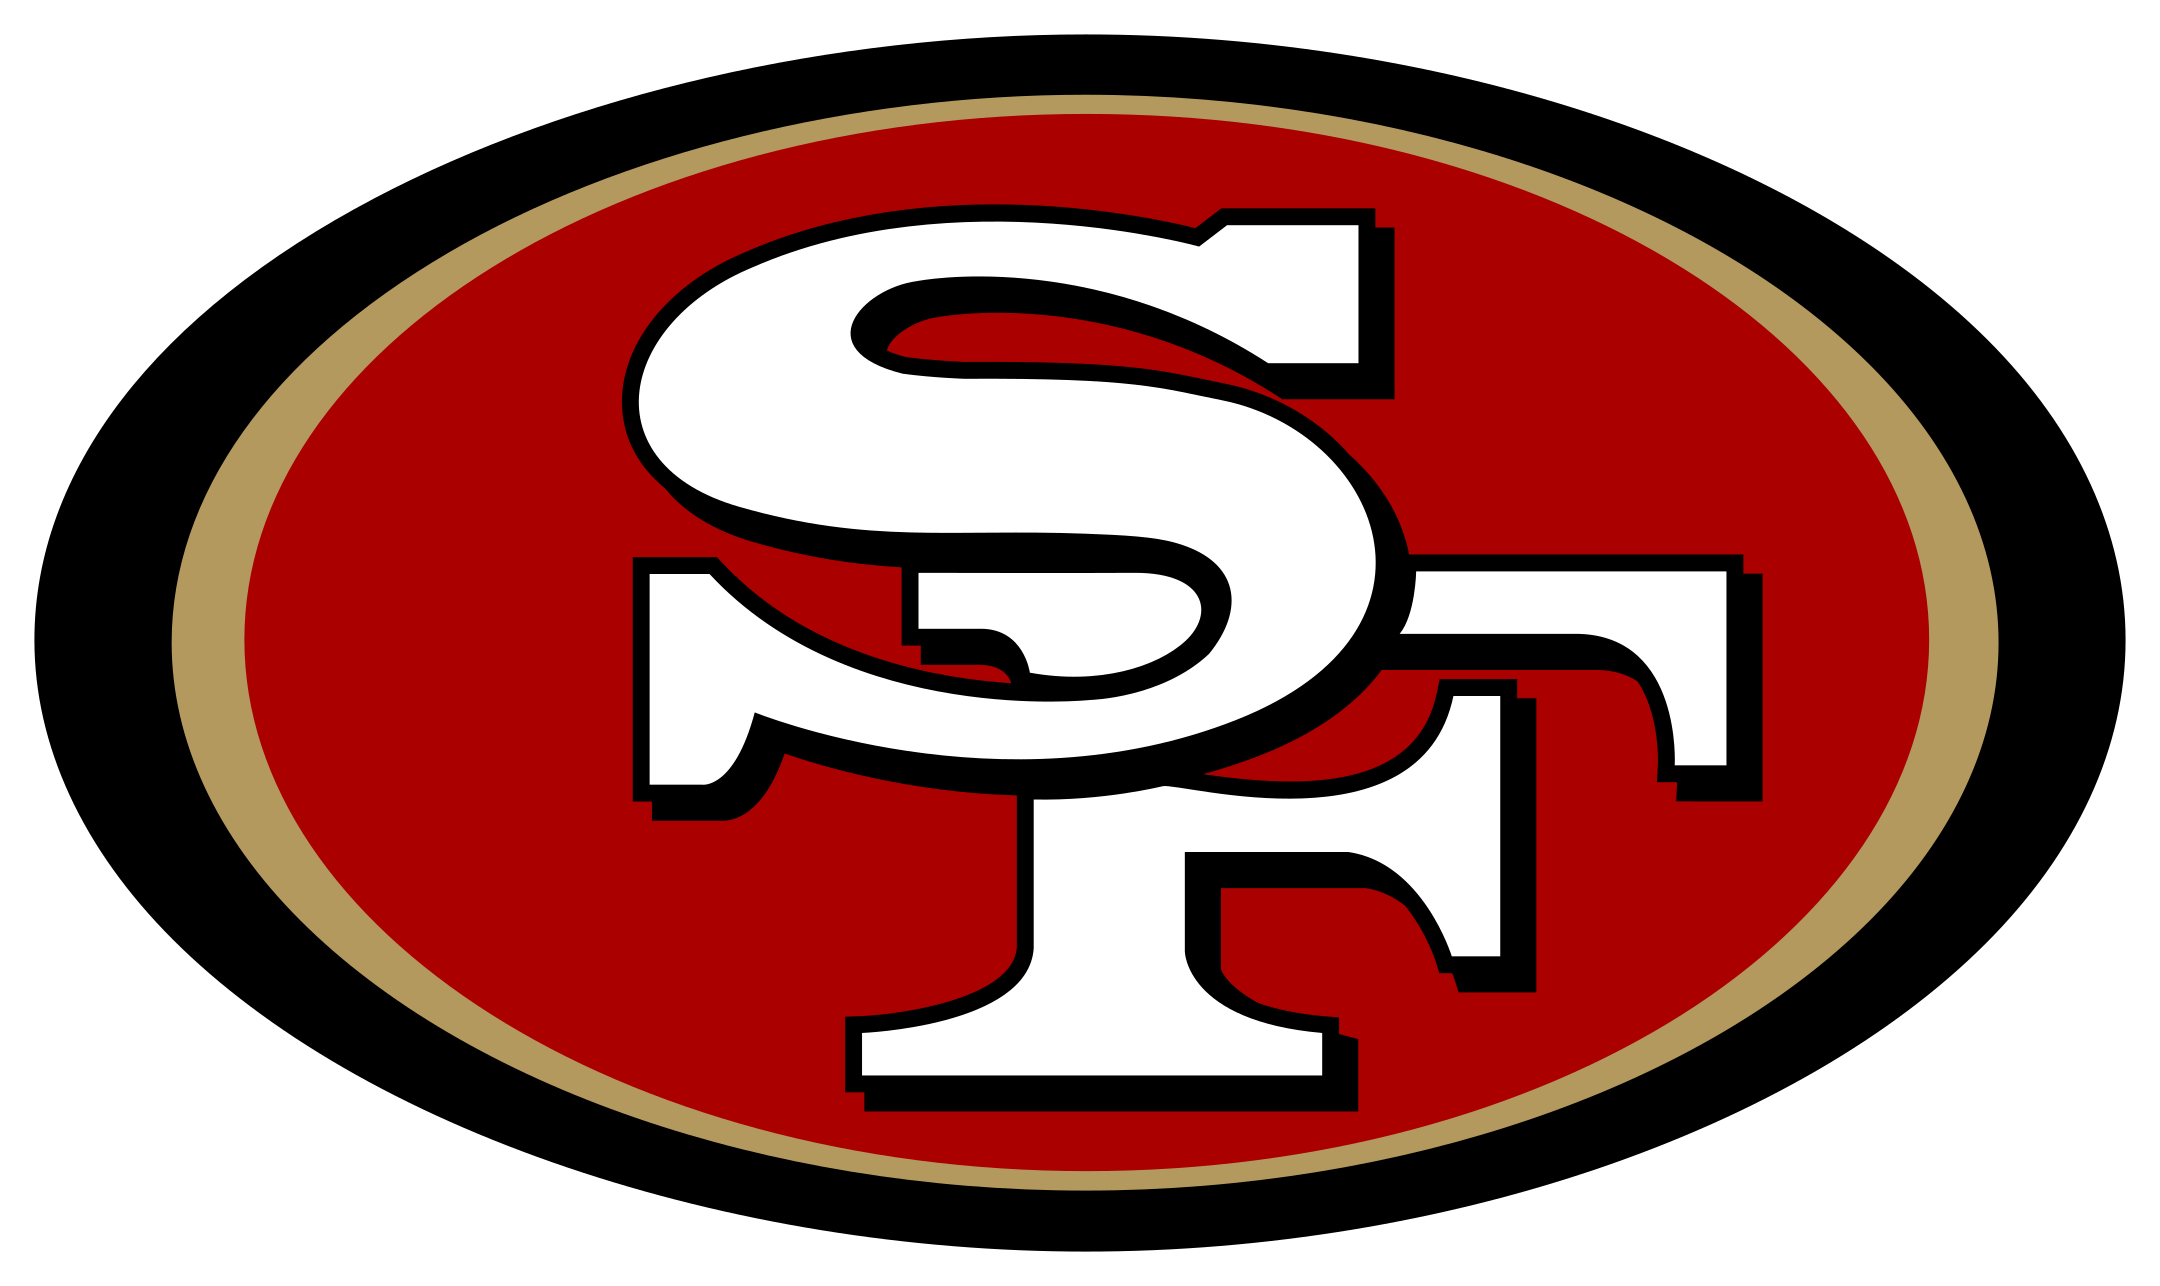 san francisco 49ers logo 1 - San Francisco 49ers Logo